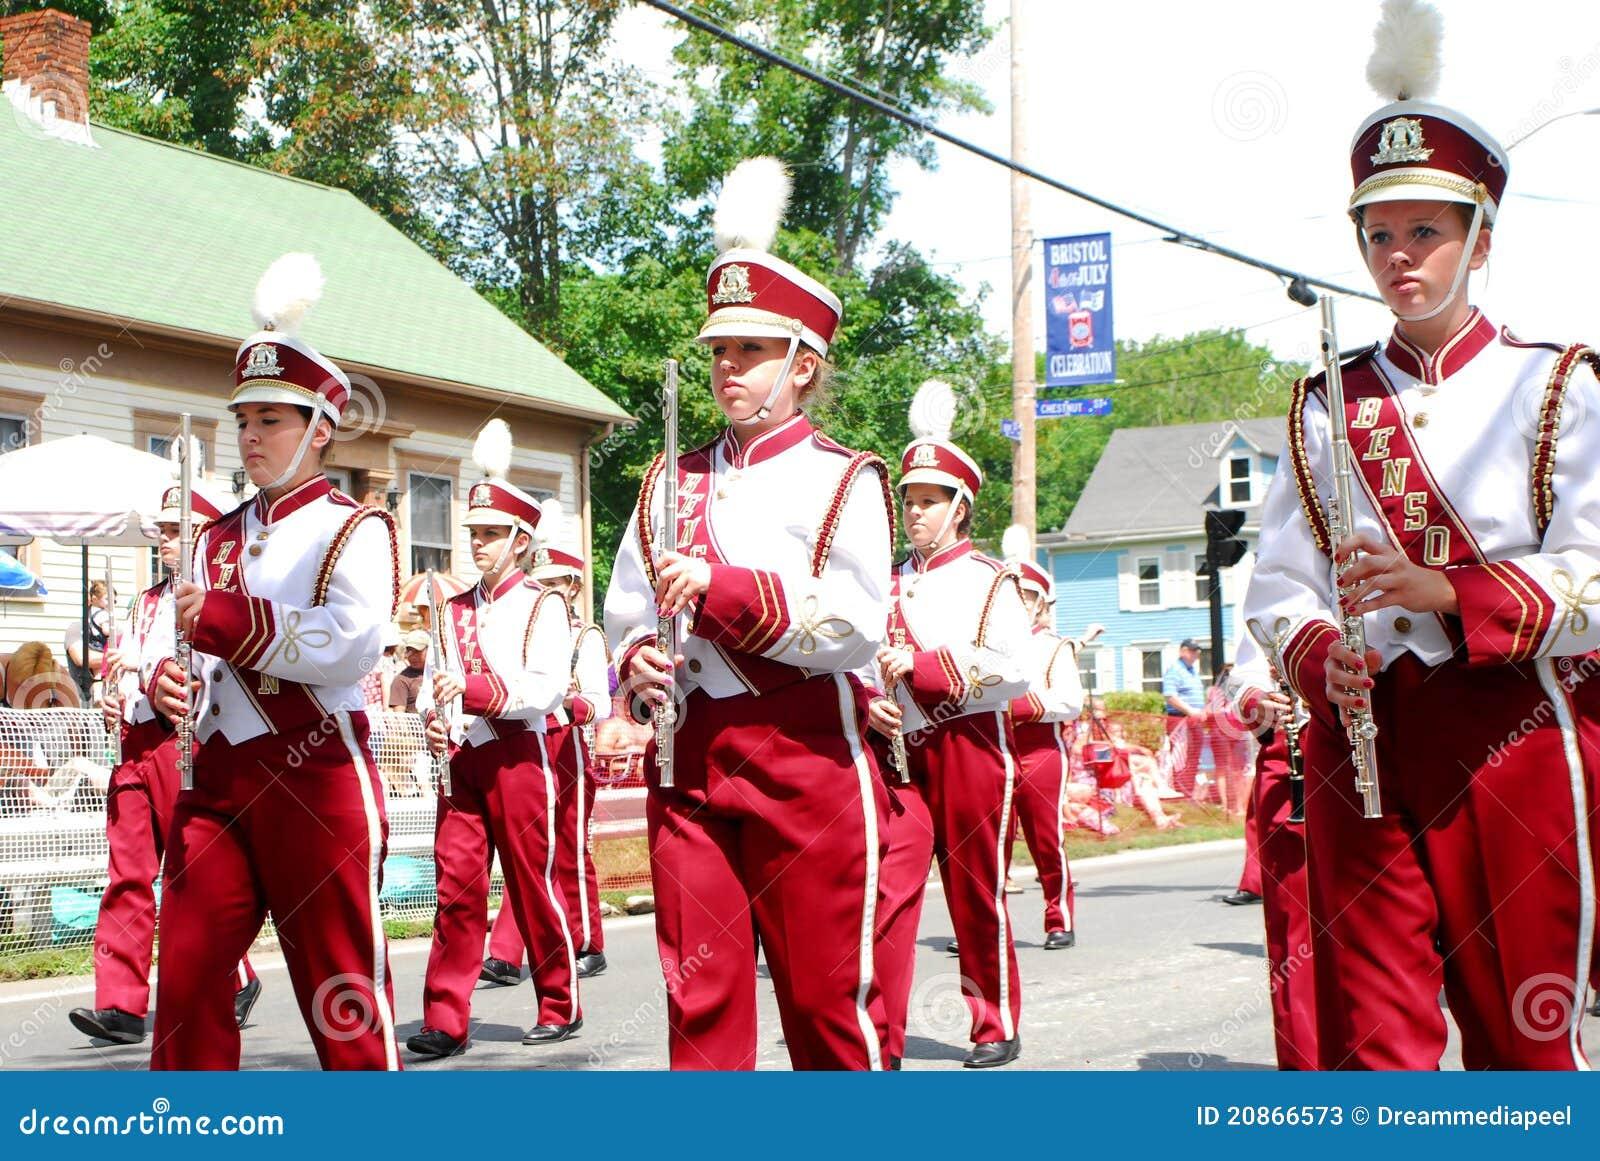 Benson High School Marching Band, Benson, MN